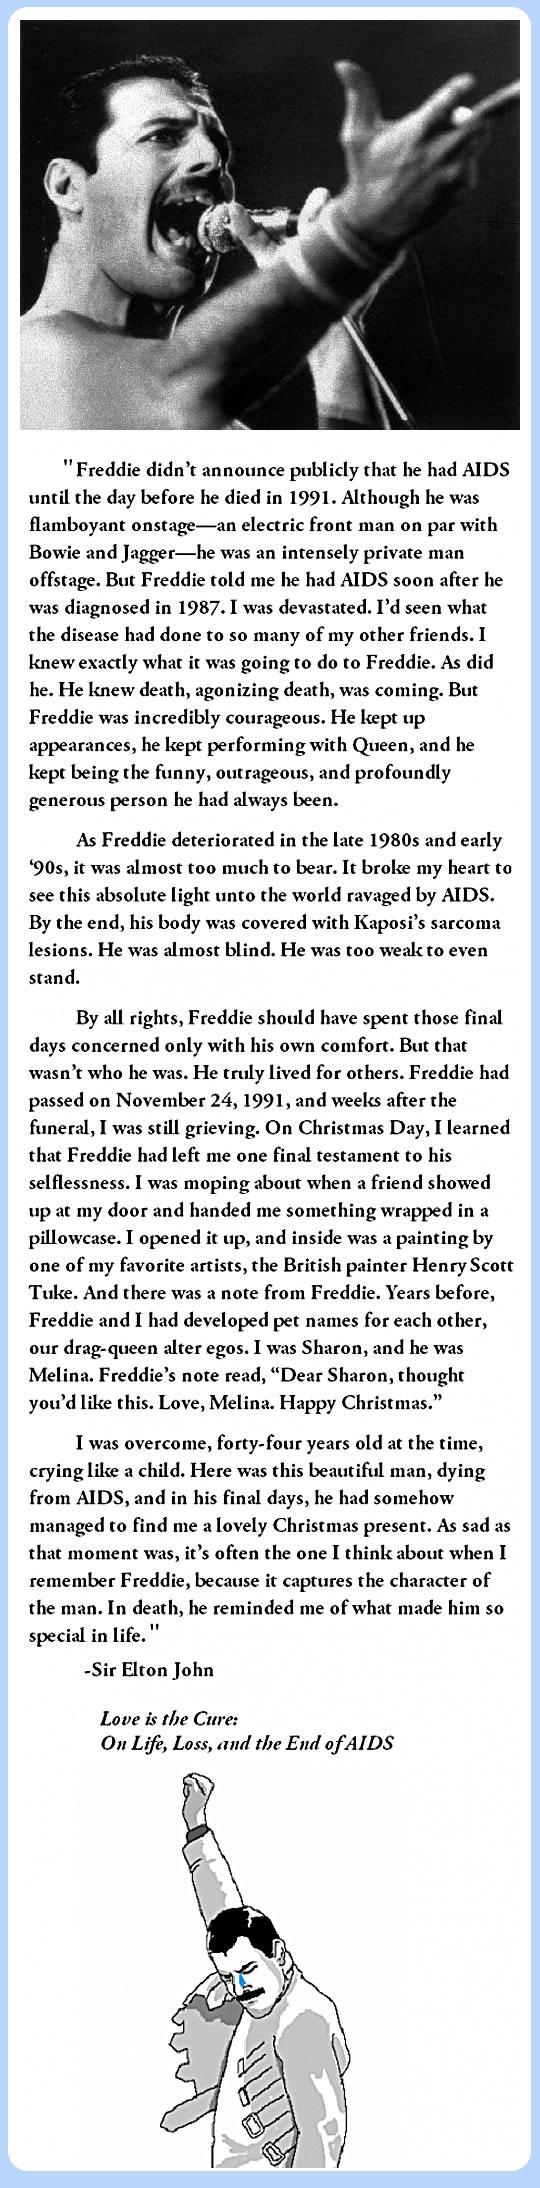 freddie_8